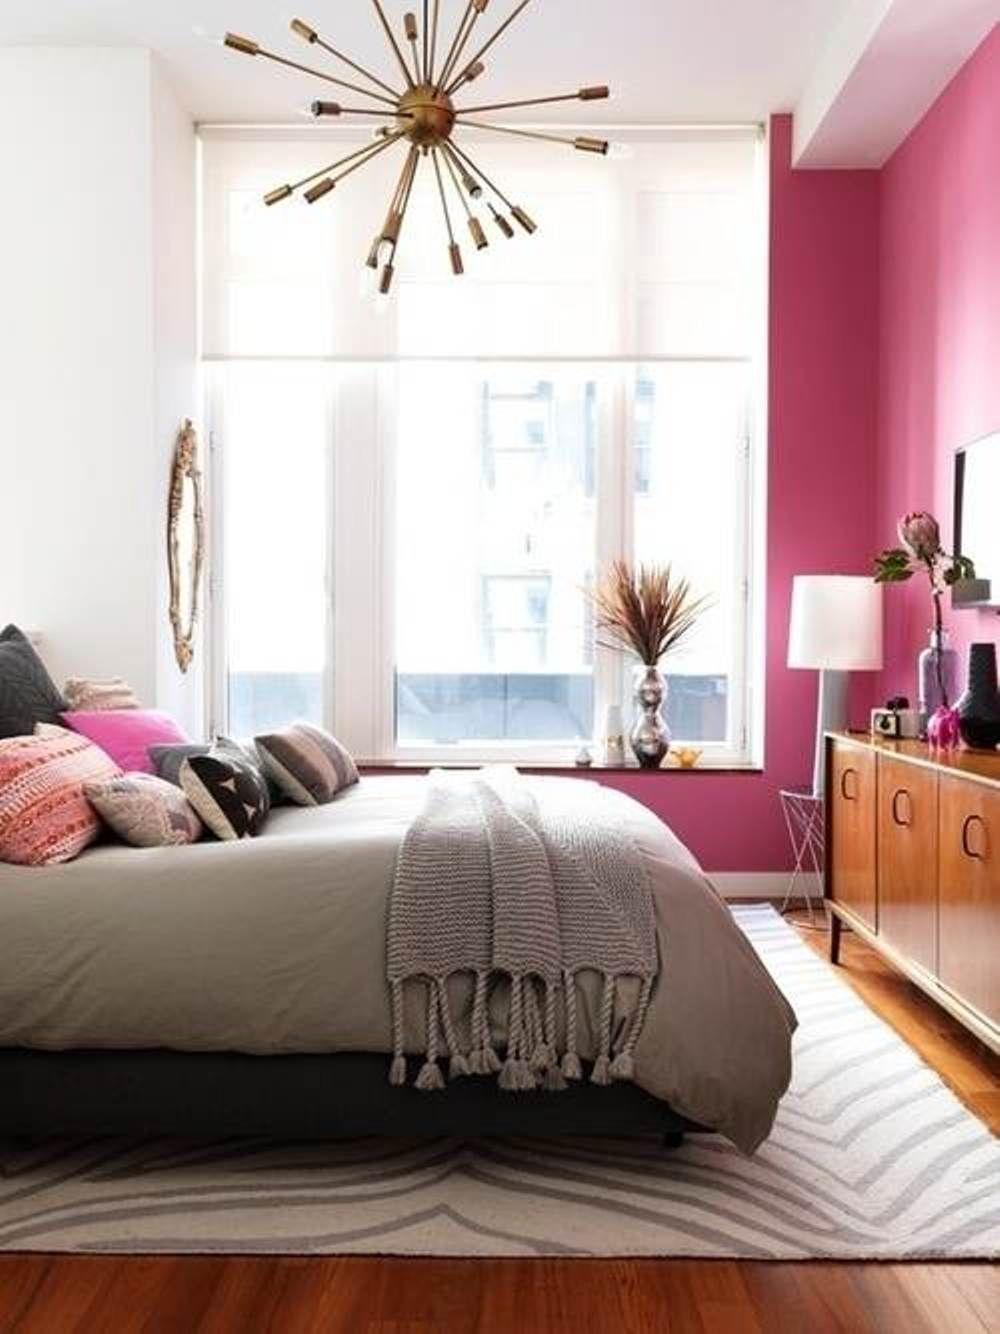 Small Bedroom Decorating Ideas For A Single Woman Valoblogi Com